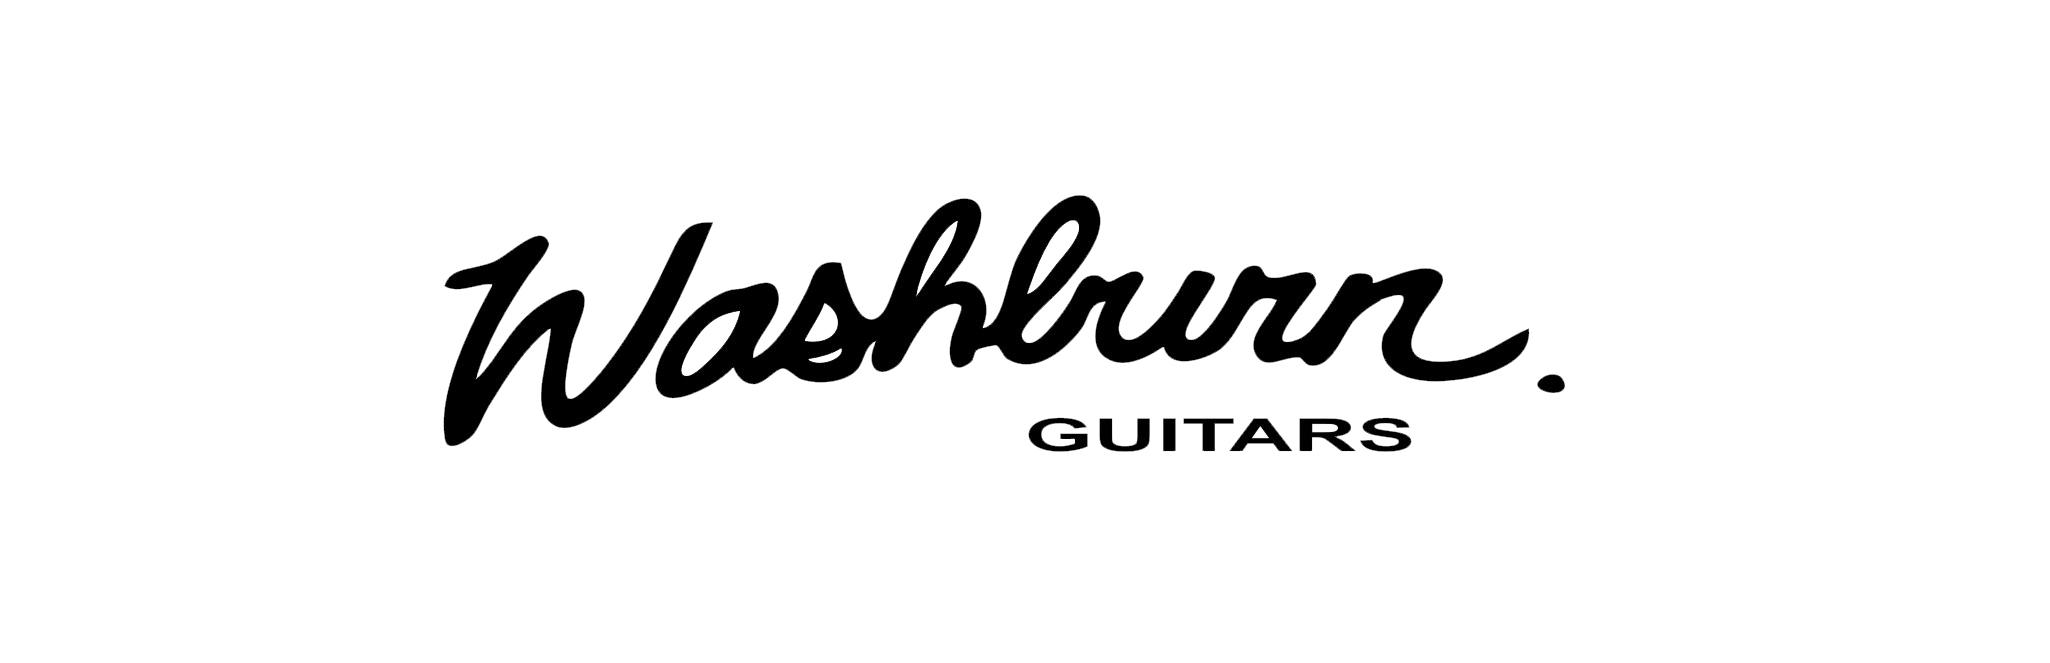 washburn-logo2.jpg